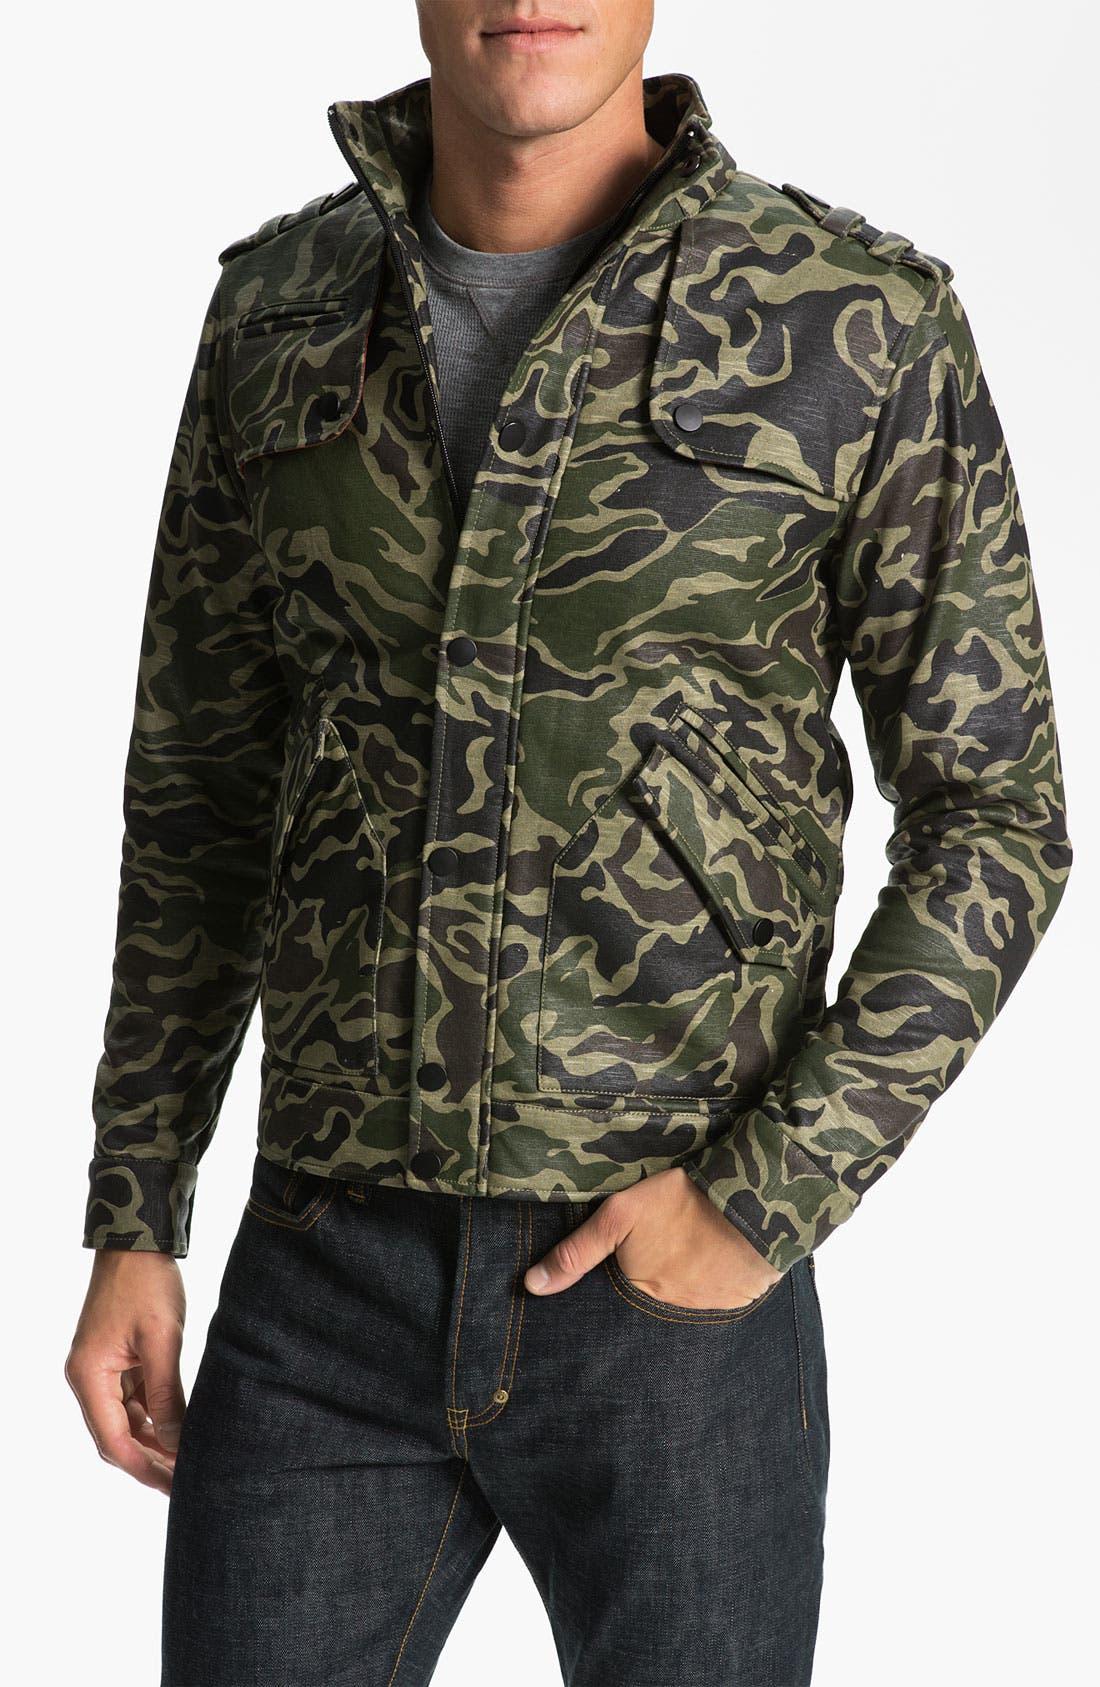 KANE & UNKE Slub Knit Trim Fit Camo Jacket, Main, color, 964